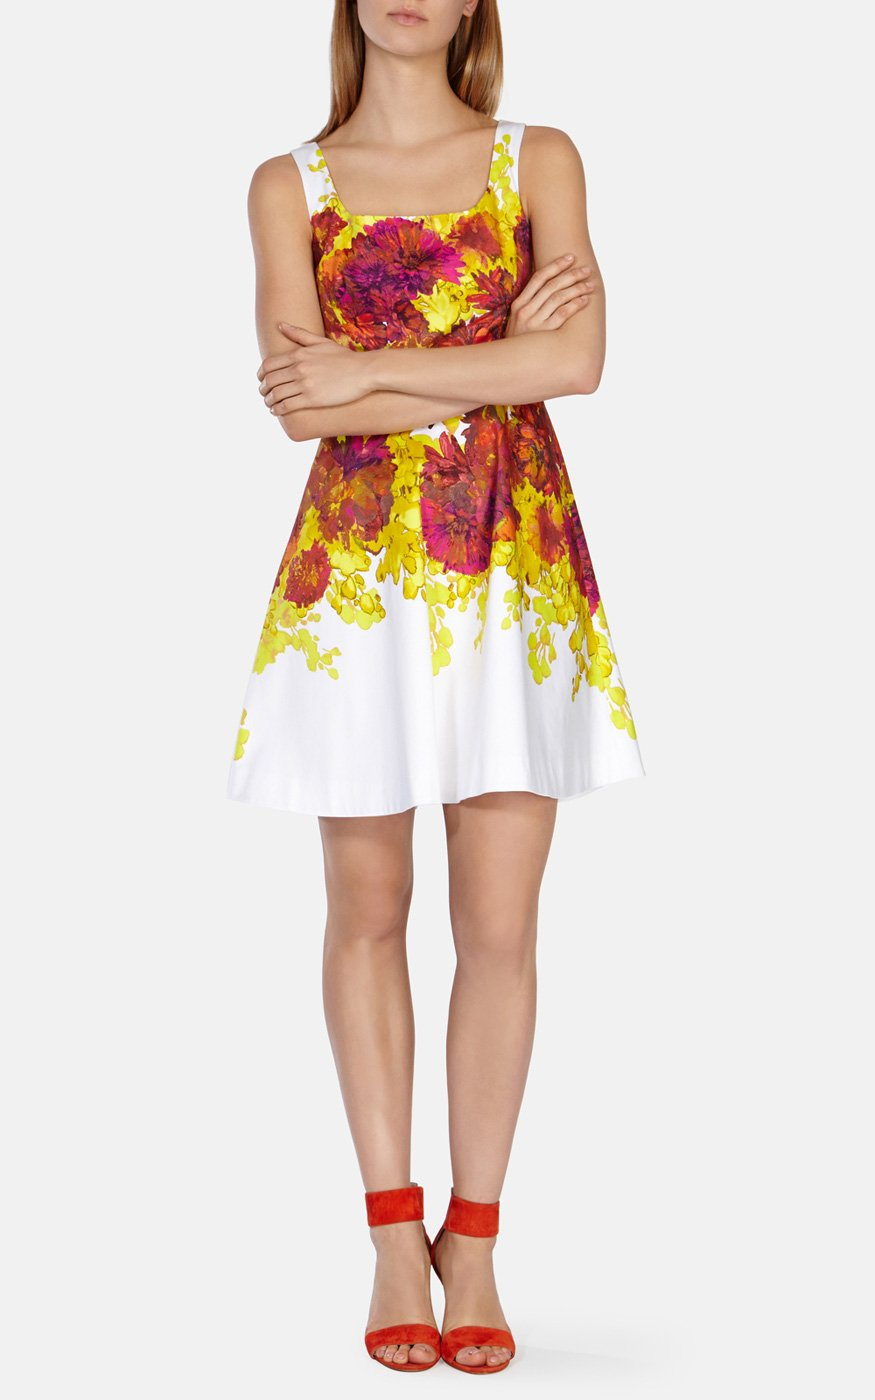 Lyst karen millen colourful painted floral cotton dress gallery ombrellifo Choice Image